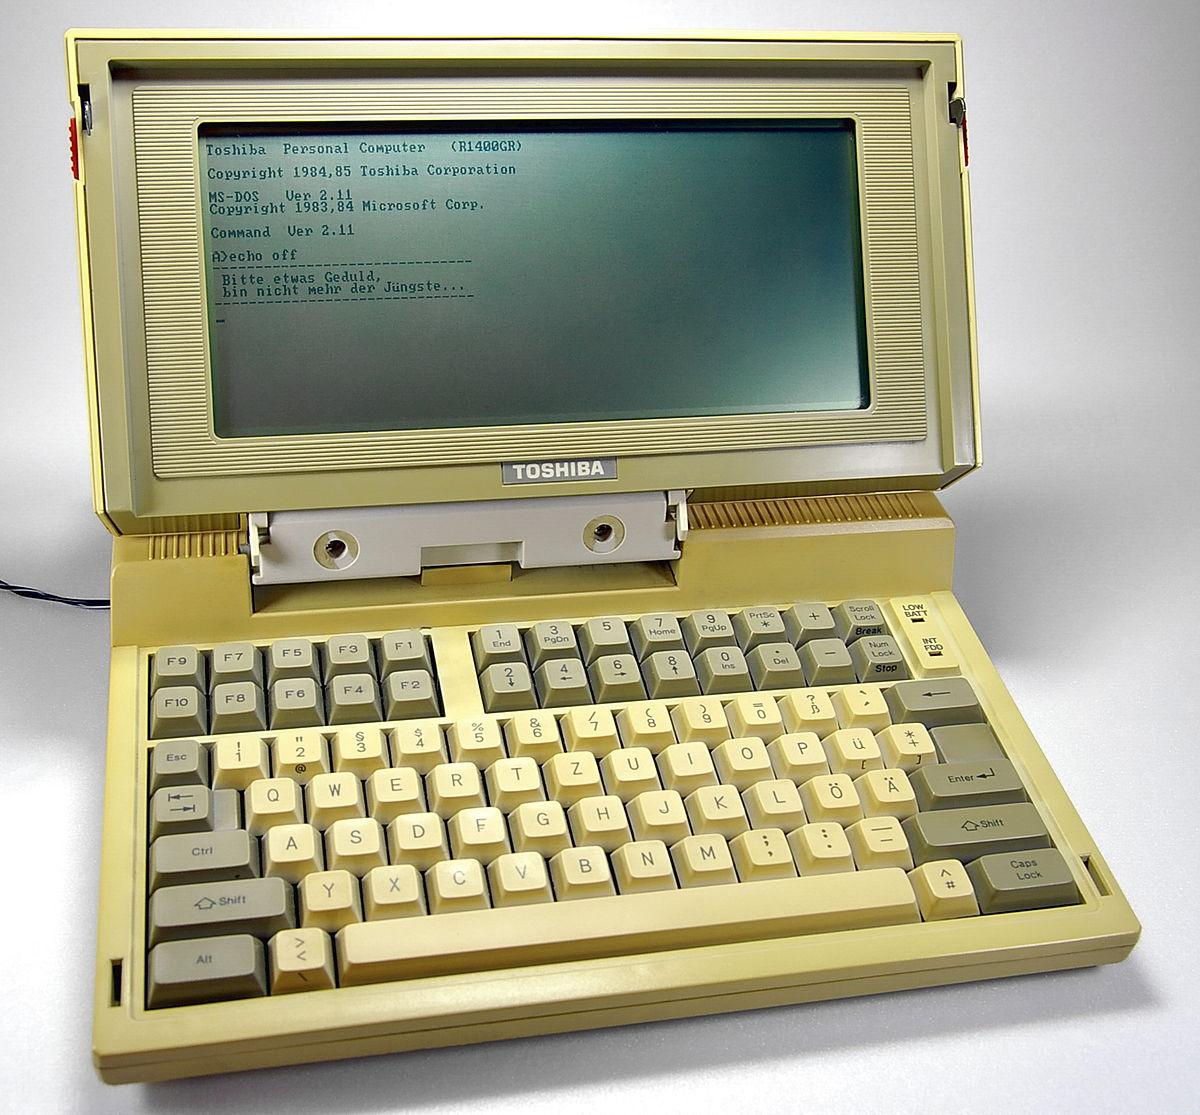 Toshiba T1100 - Wikipedia, la enciclopedia libre